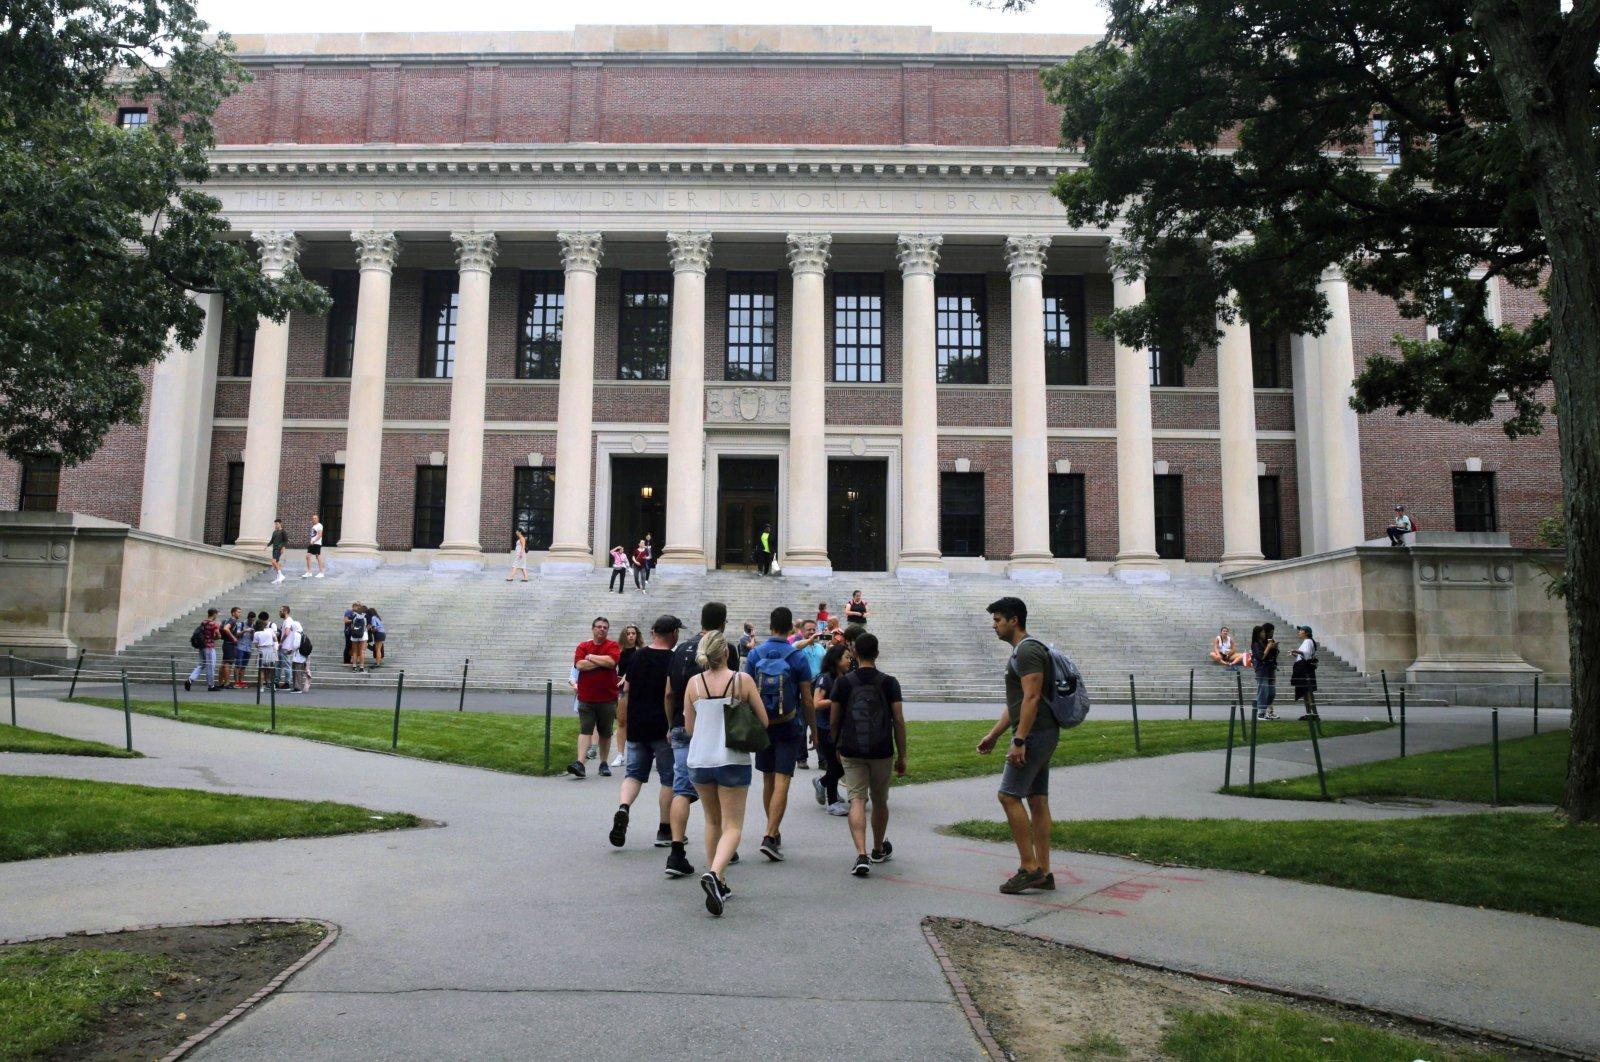 Students walk near the Widener Library at Harvard University in Cambridge, Mass., U.S., Aug. 13, 2019. (AP Photo)